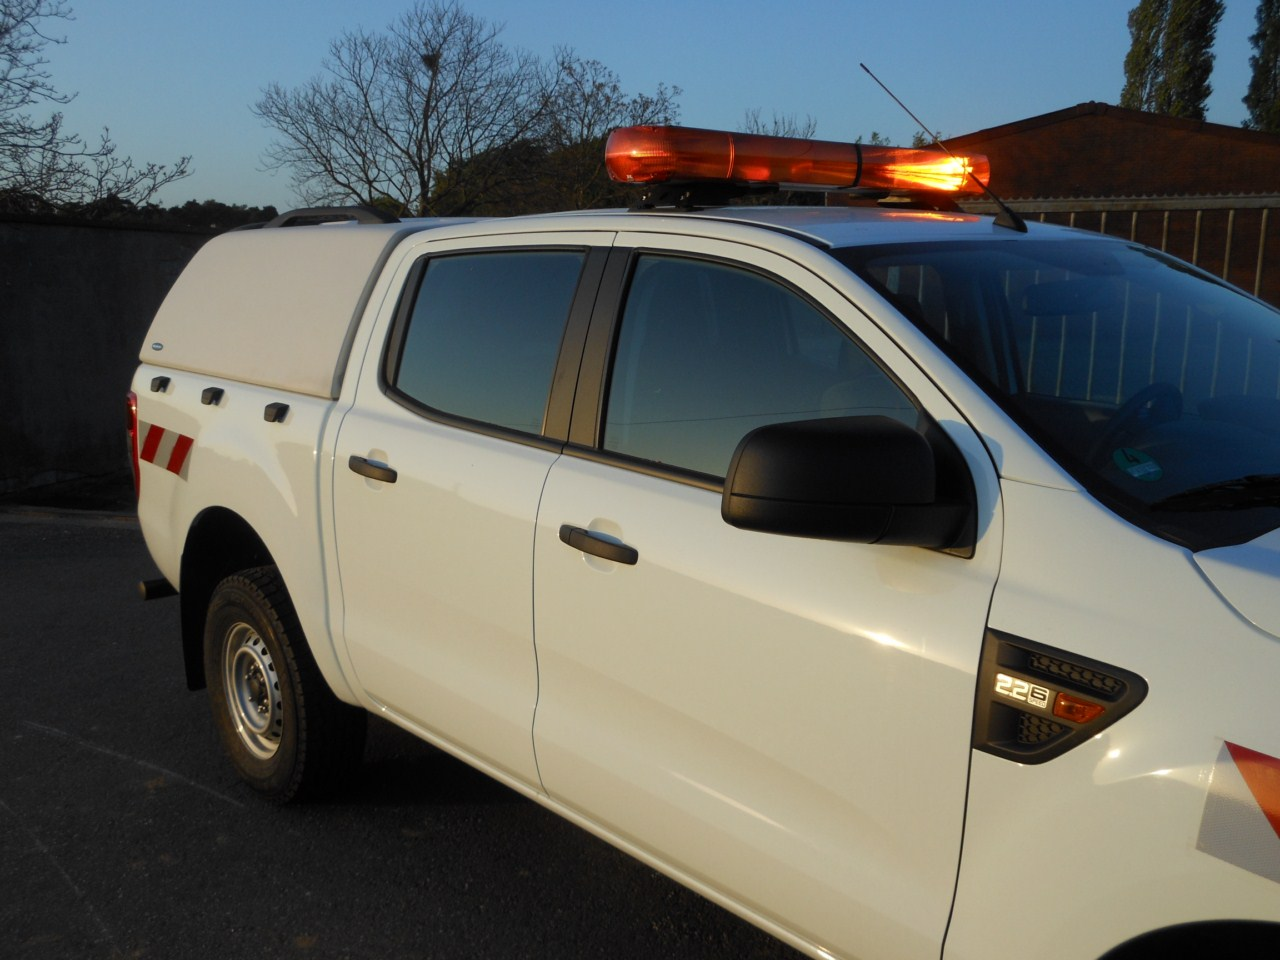 CARRYBOY Hardtop 560os_TVD ohne Seitenfenster Toyota Hilux Vigo Doppelkabine 2005-2015 Wagenfarbe